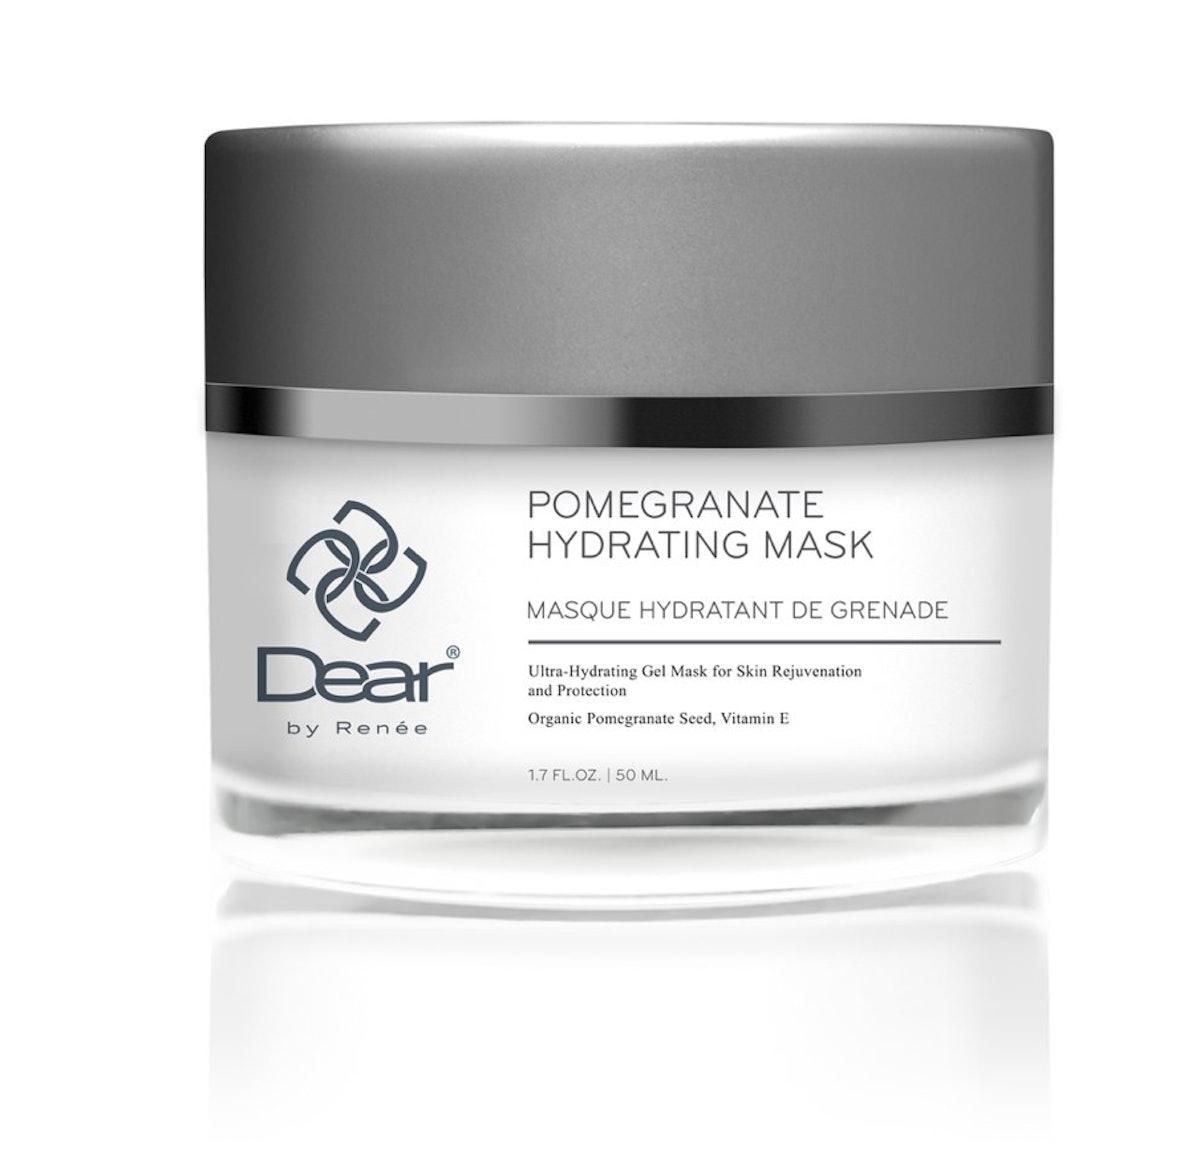 Pomegranate Hydrating Mask